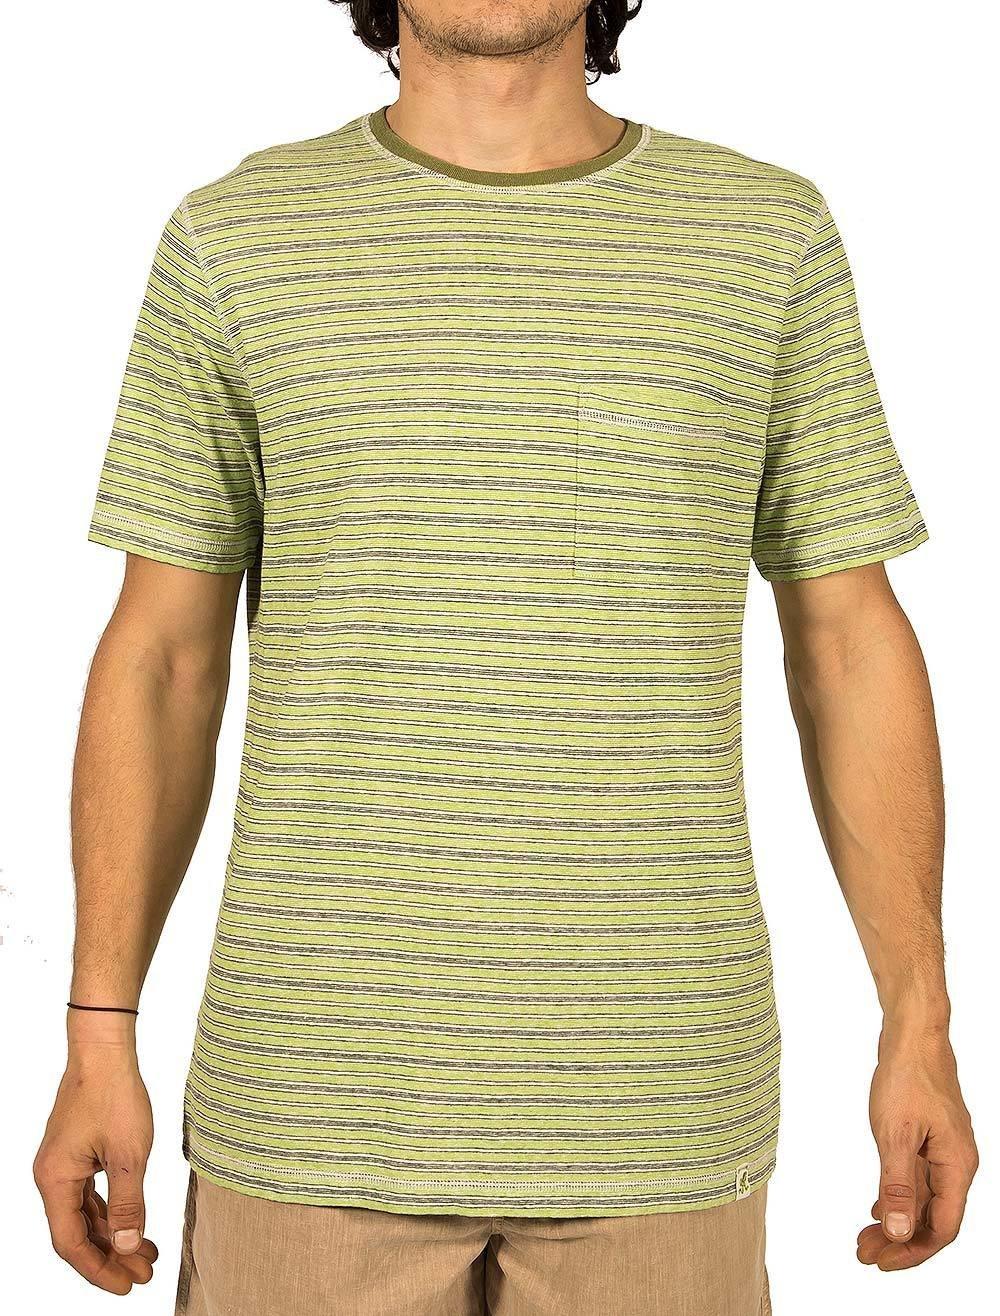 Gramicci Lakeside Men's Short Sleeve Tee